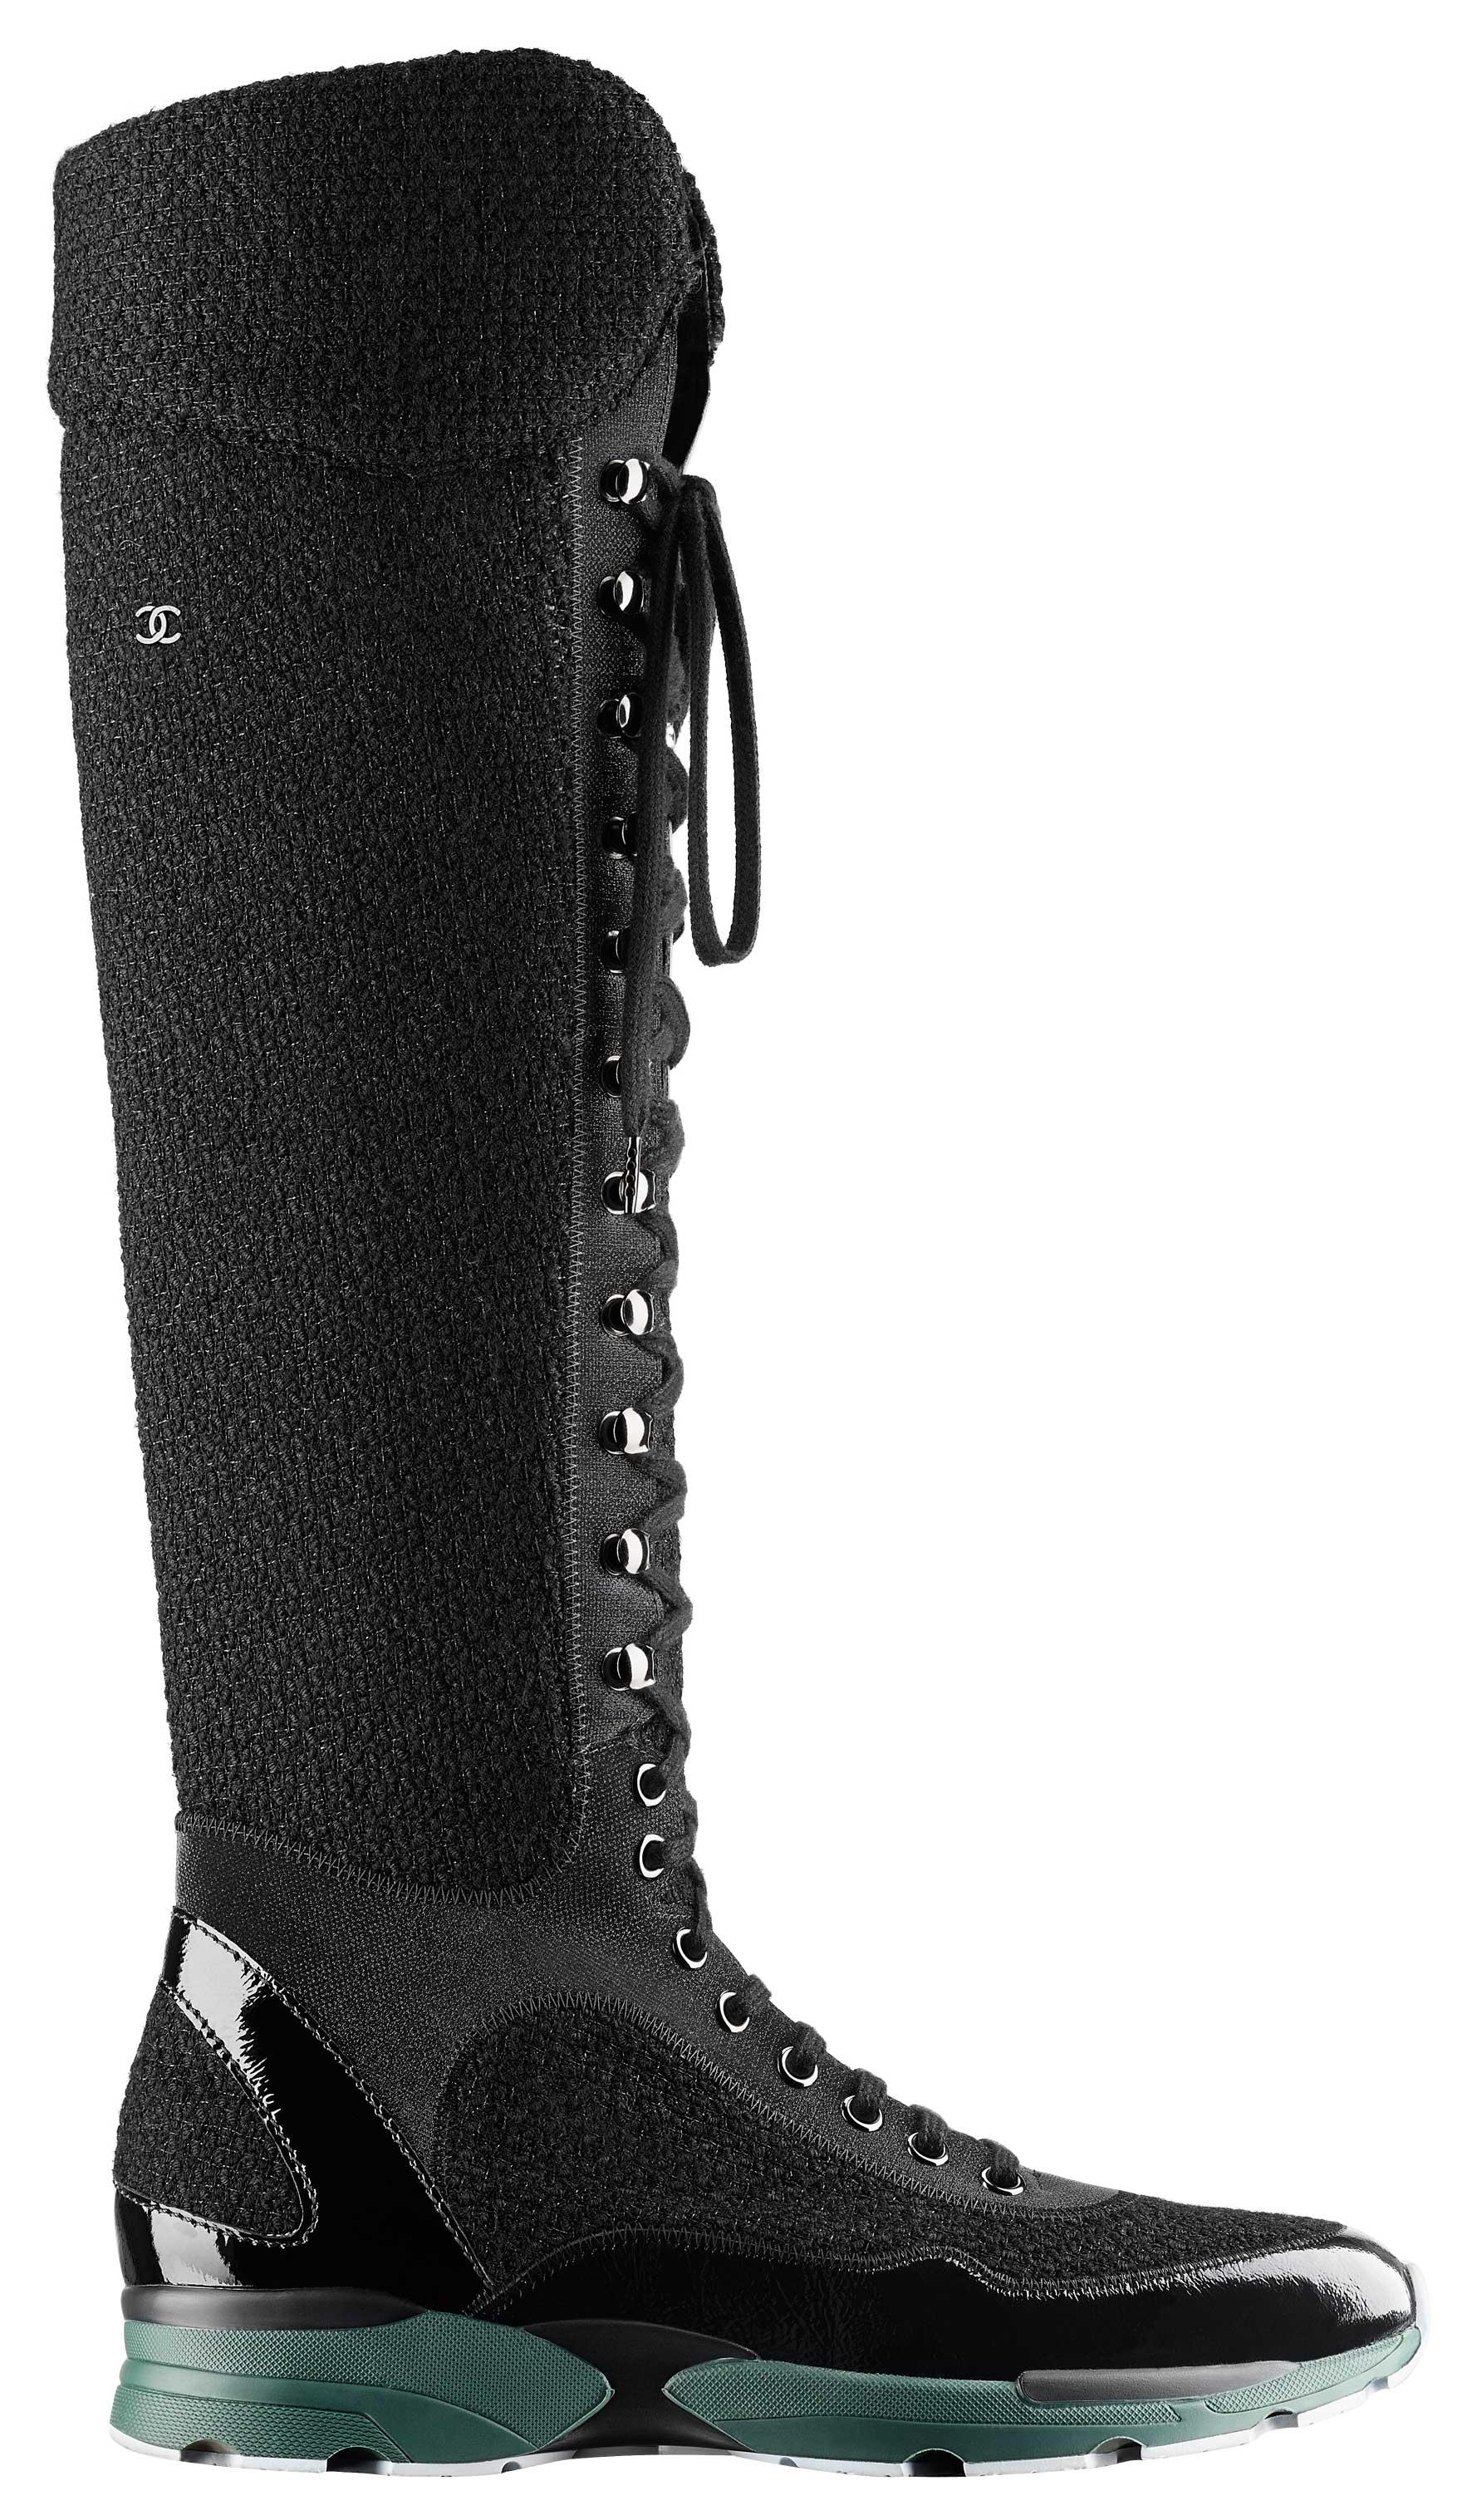 Black-tweed,-leather-and-rubber-sneaker-Basket-noire-en-tweed,-cuir-et-caoutchouc